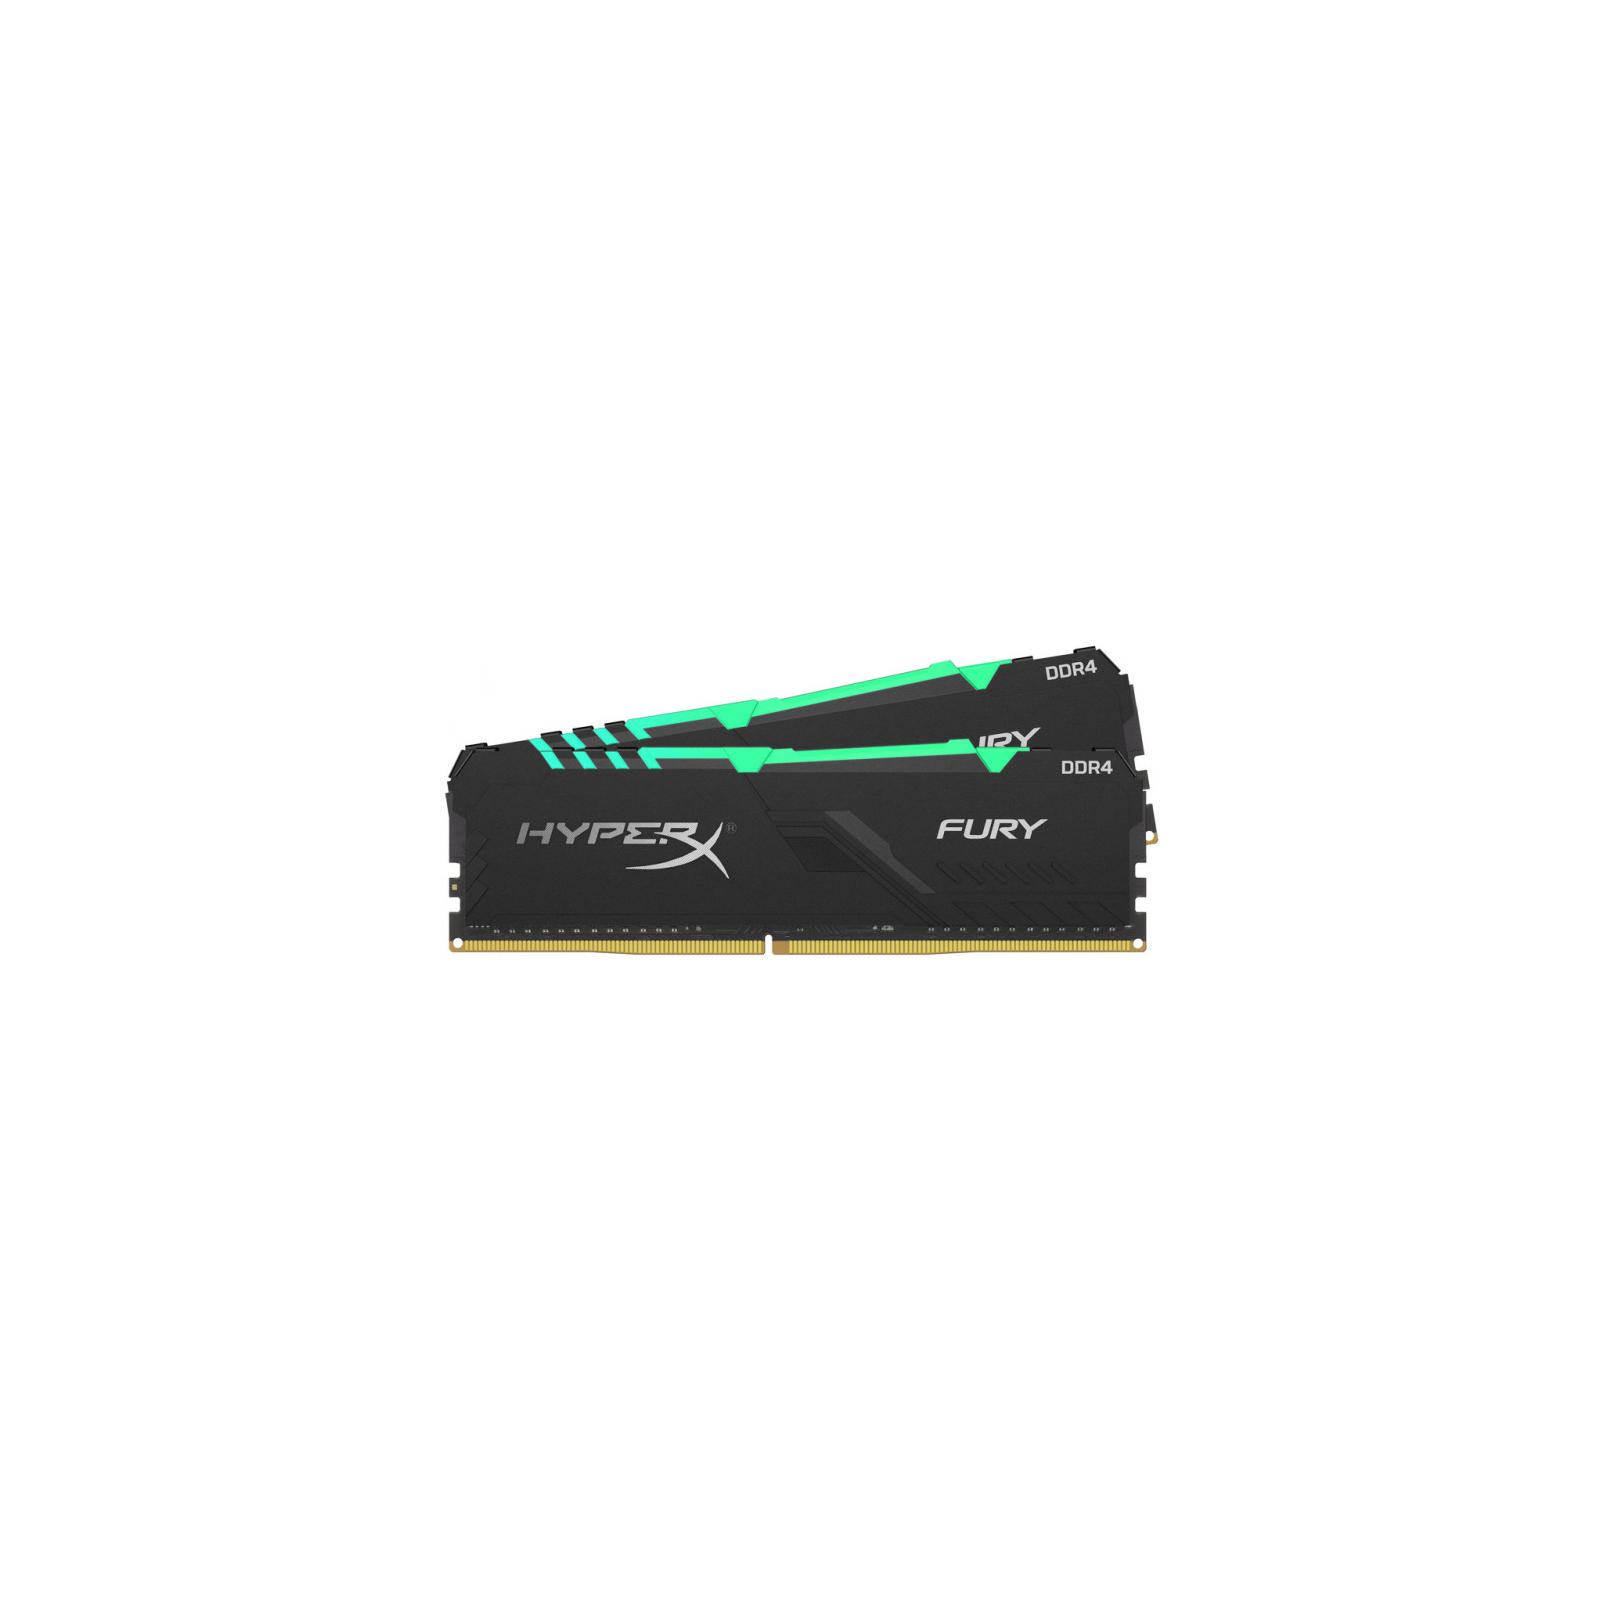 Модуль памяти для компьютера DDR4 32GB (2x16GB) 3733 MHz HyperX Fury RGB Kingston (HX437C19FB3AK2/32) изображение 4